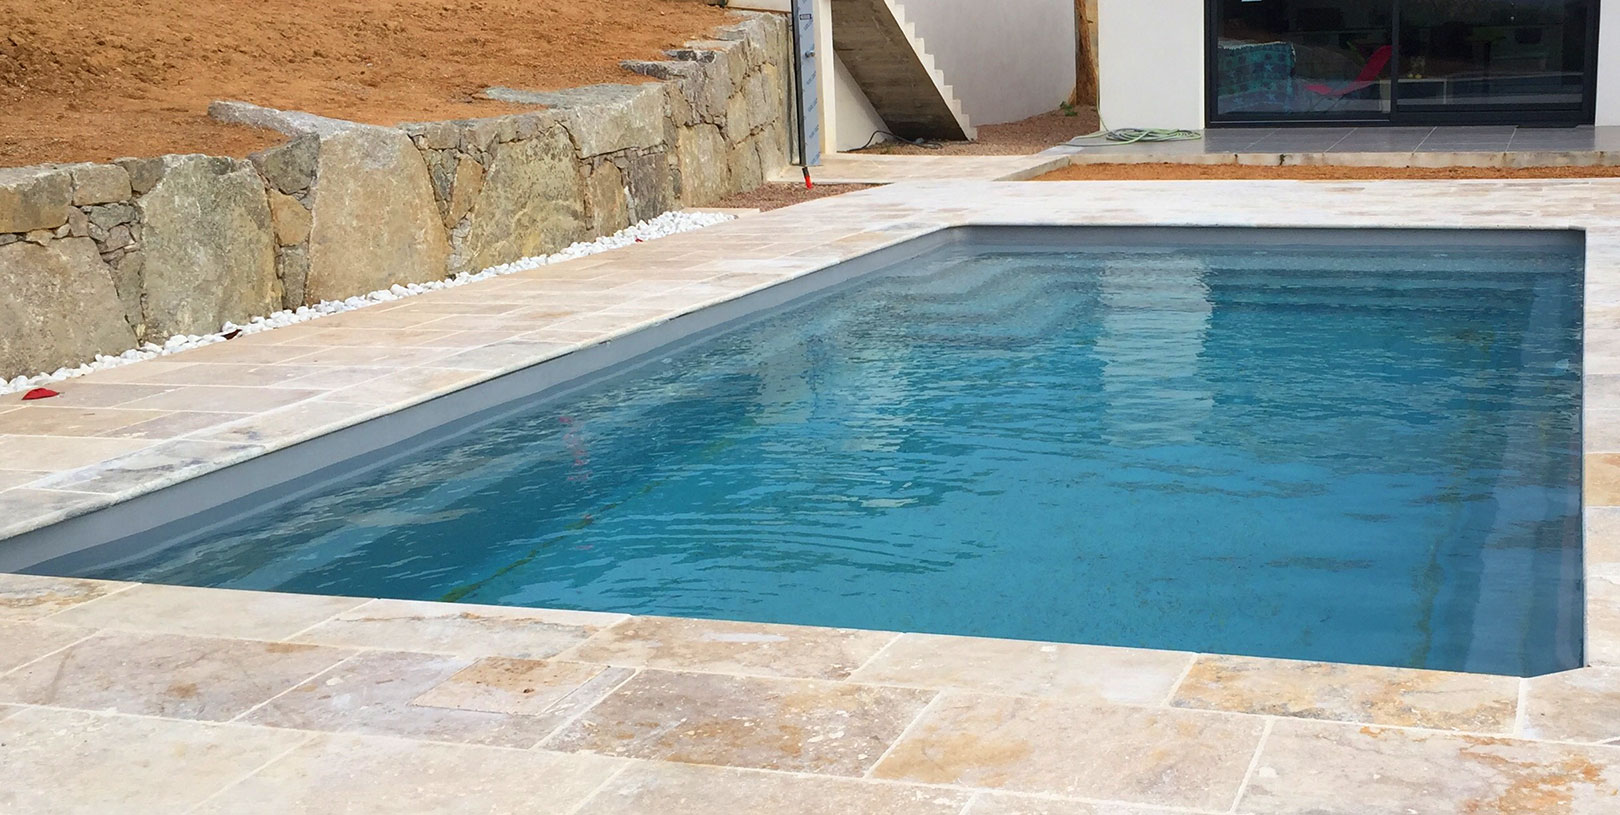 mapico, piscine coque polyester, piscine coque, porto-vecchio, corse, jardin, réalisations, devis, 15